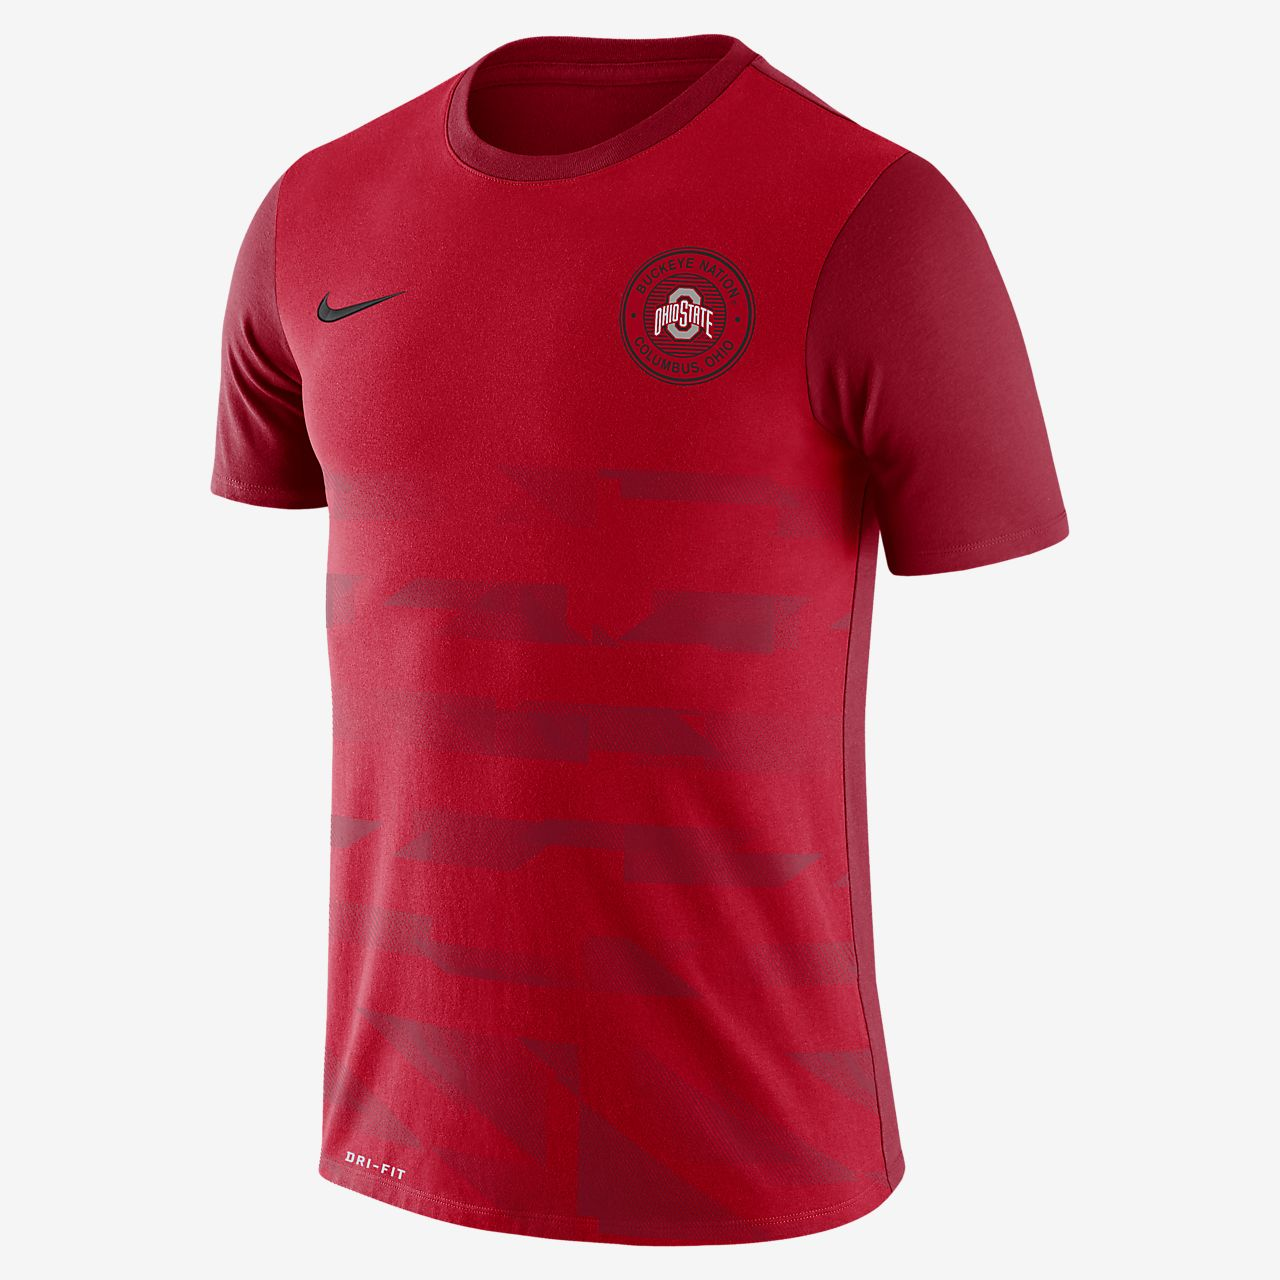 Nike College Dri-FIT Legend (Ohio State) Men's T-Shirt